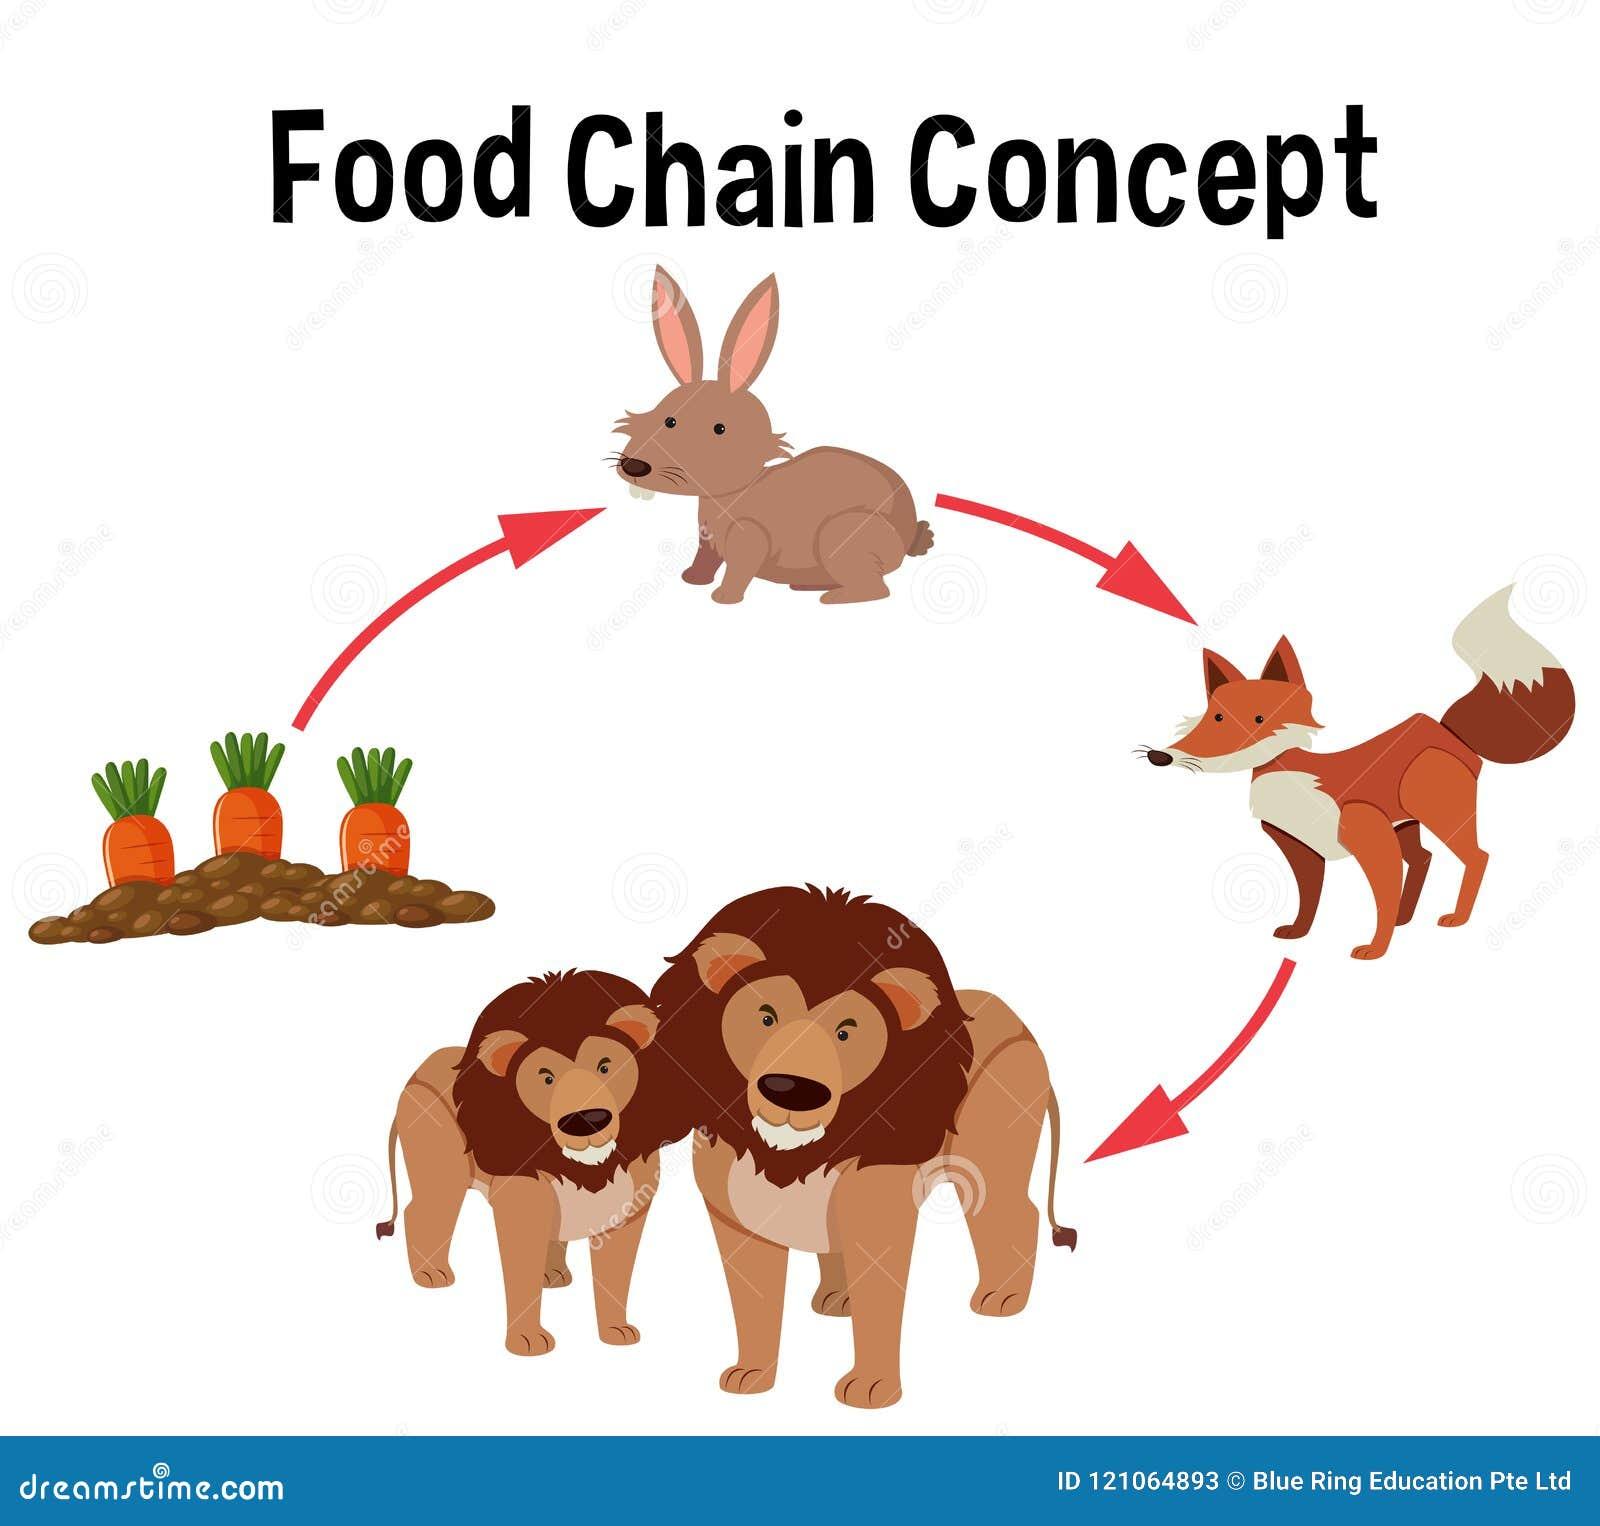 Food chain concept diagram